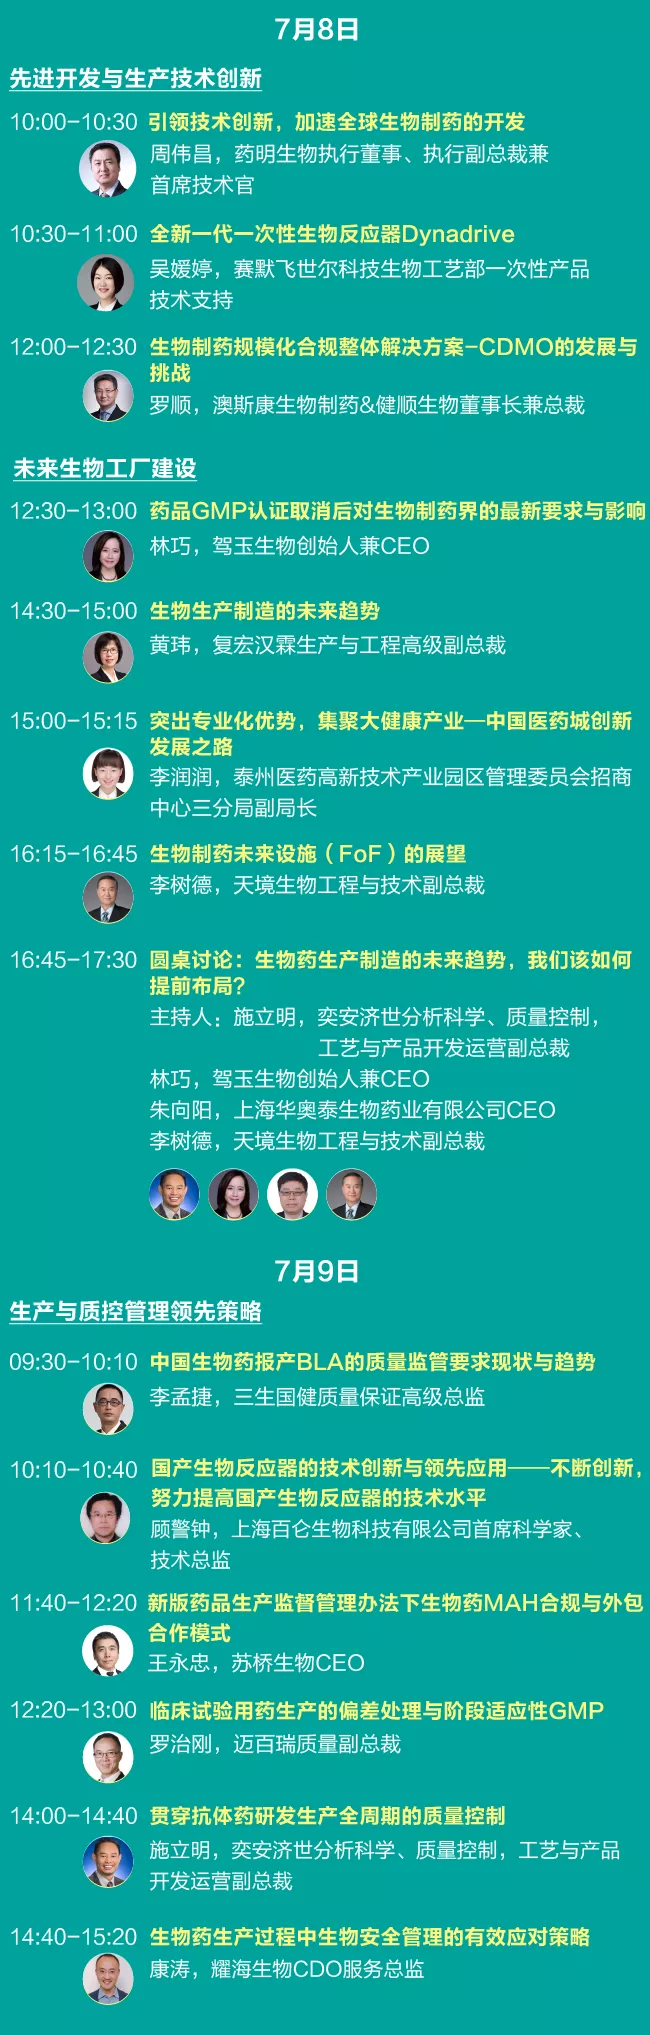 BioCon 2020:第七届国际生物药大会,AVT诚邀您莅临AVT展台-艾伟拓(上海)医药科技有限公司